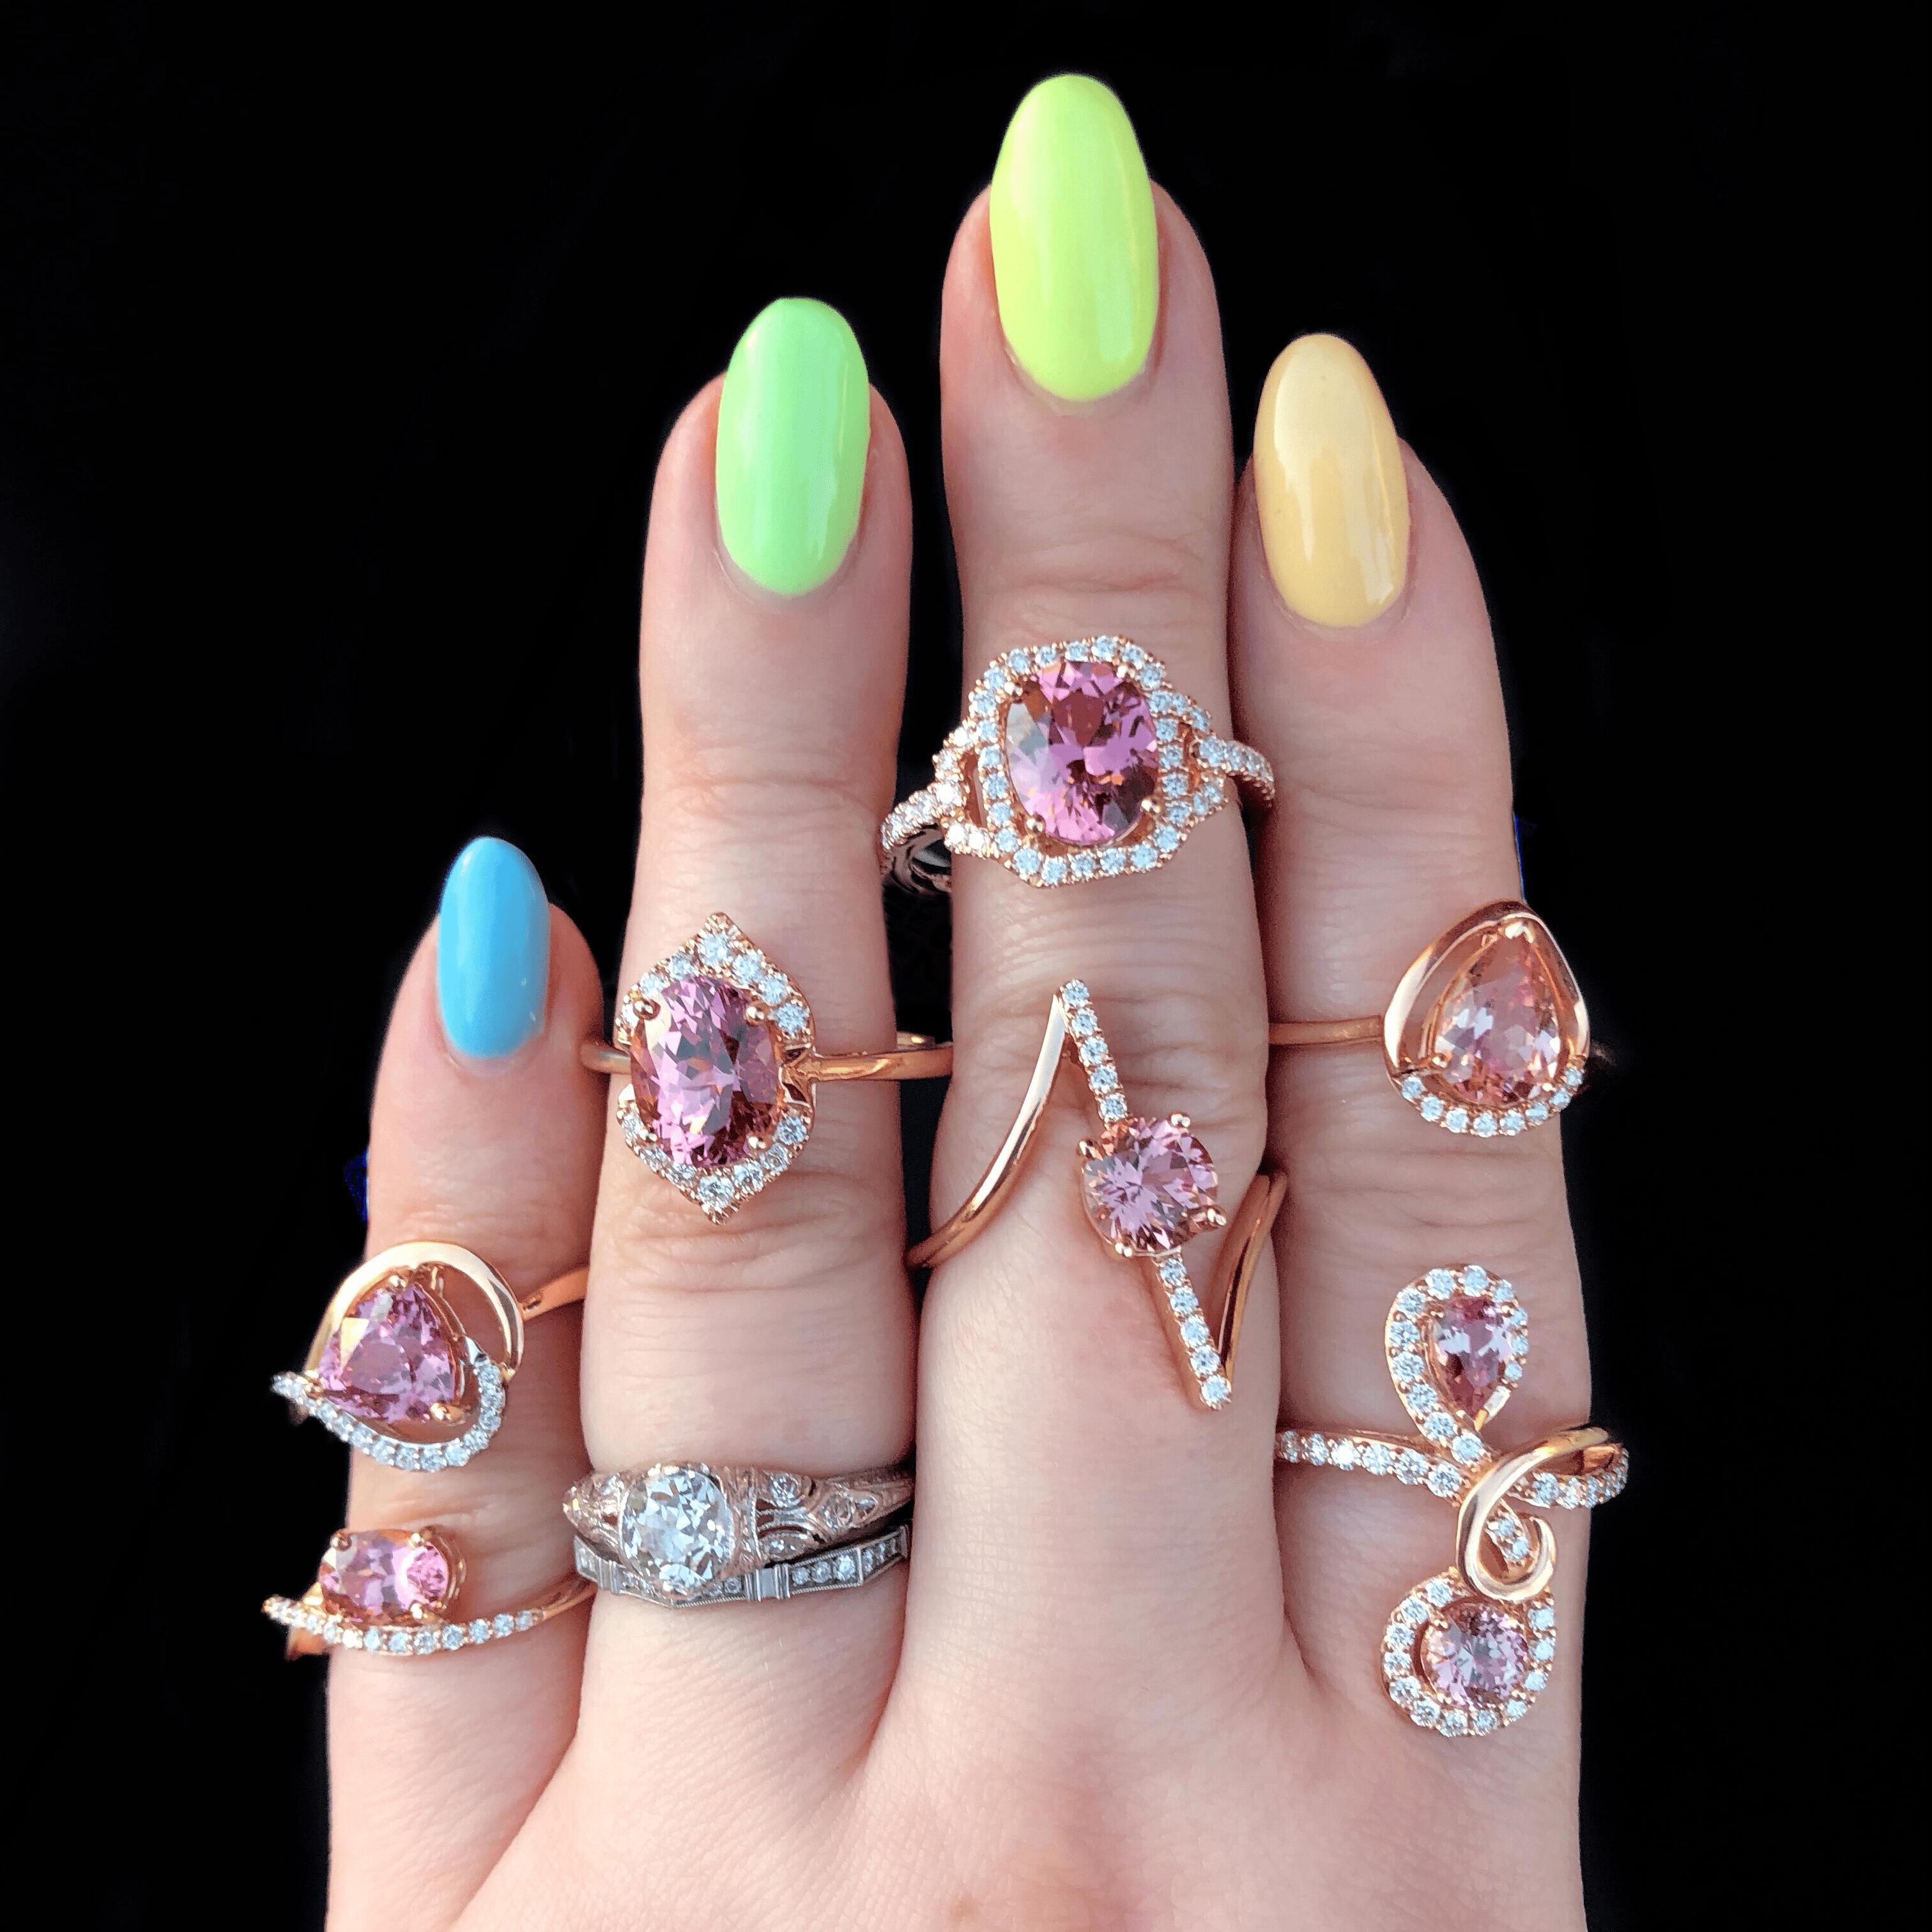 Beautiful pink lotus garnet and diamond rings by Parle Gems!